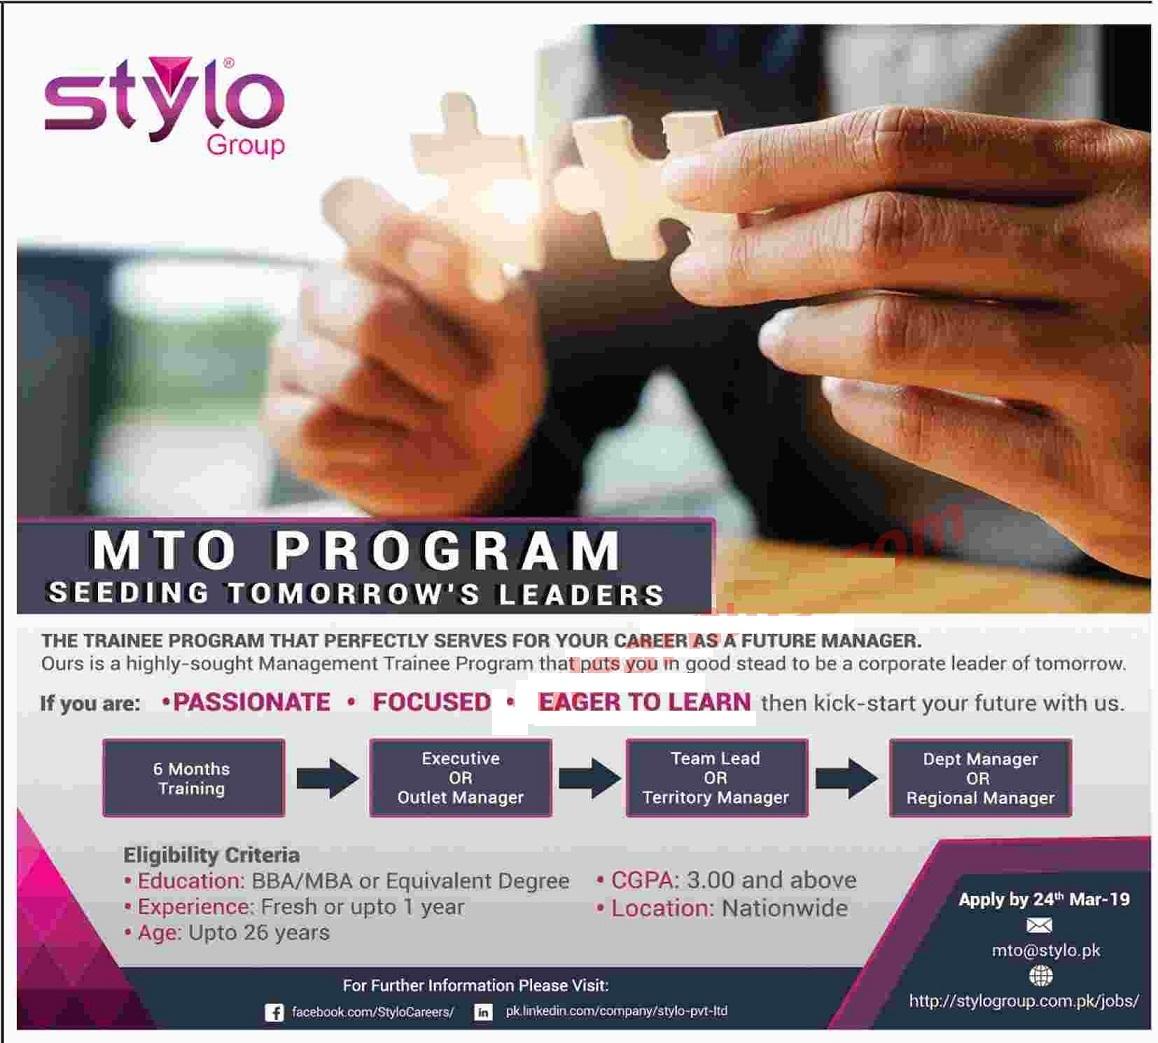 Stylo Group Pakistan Management Trainee Program 2019